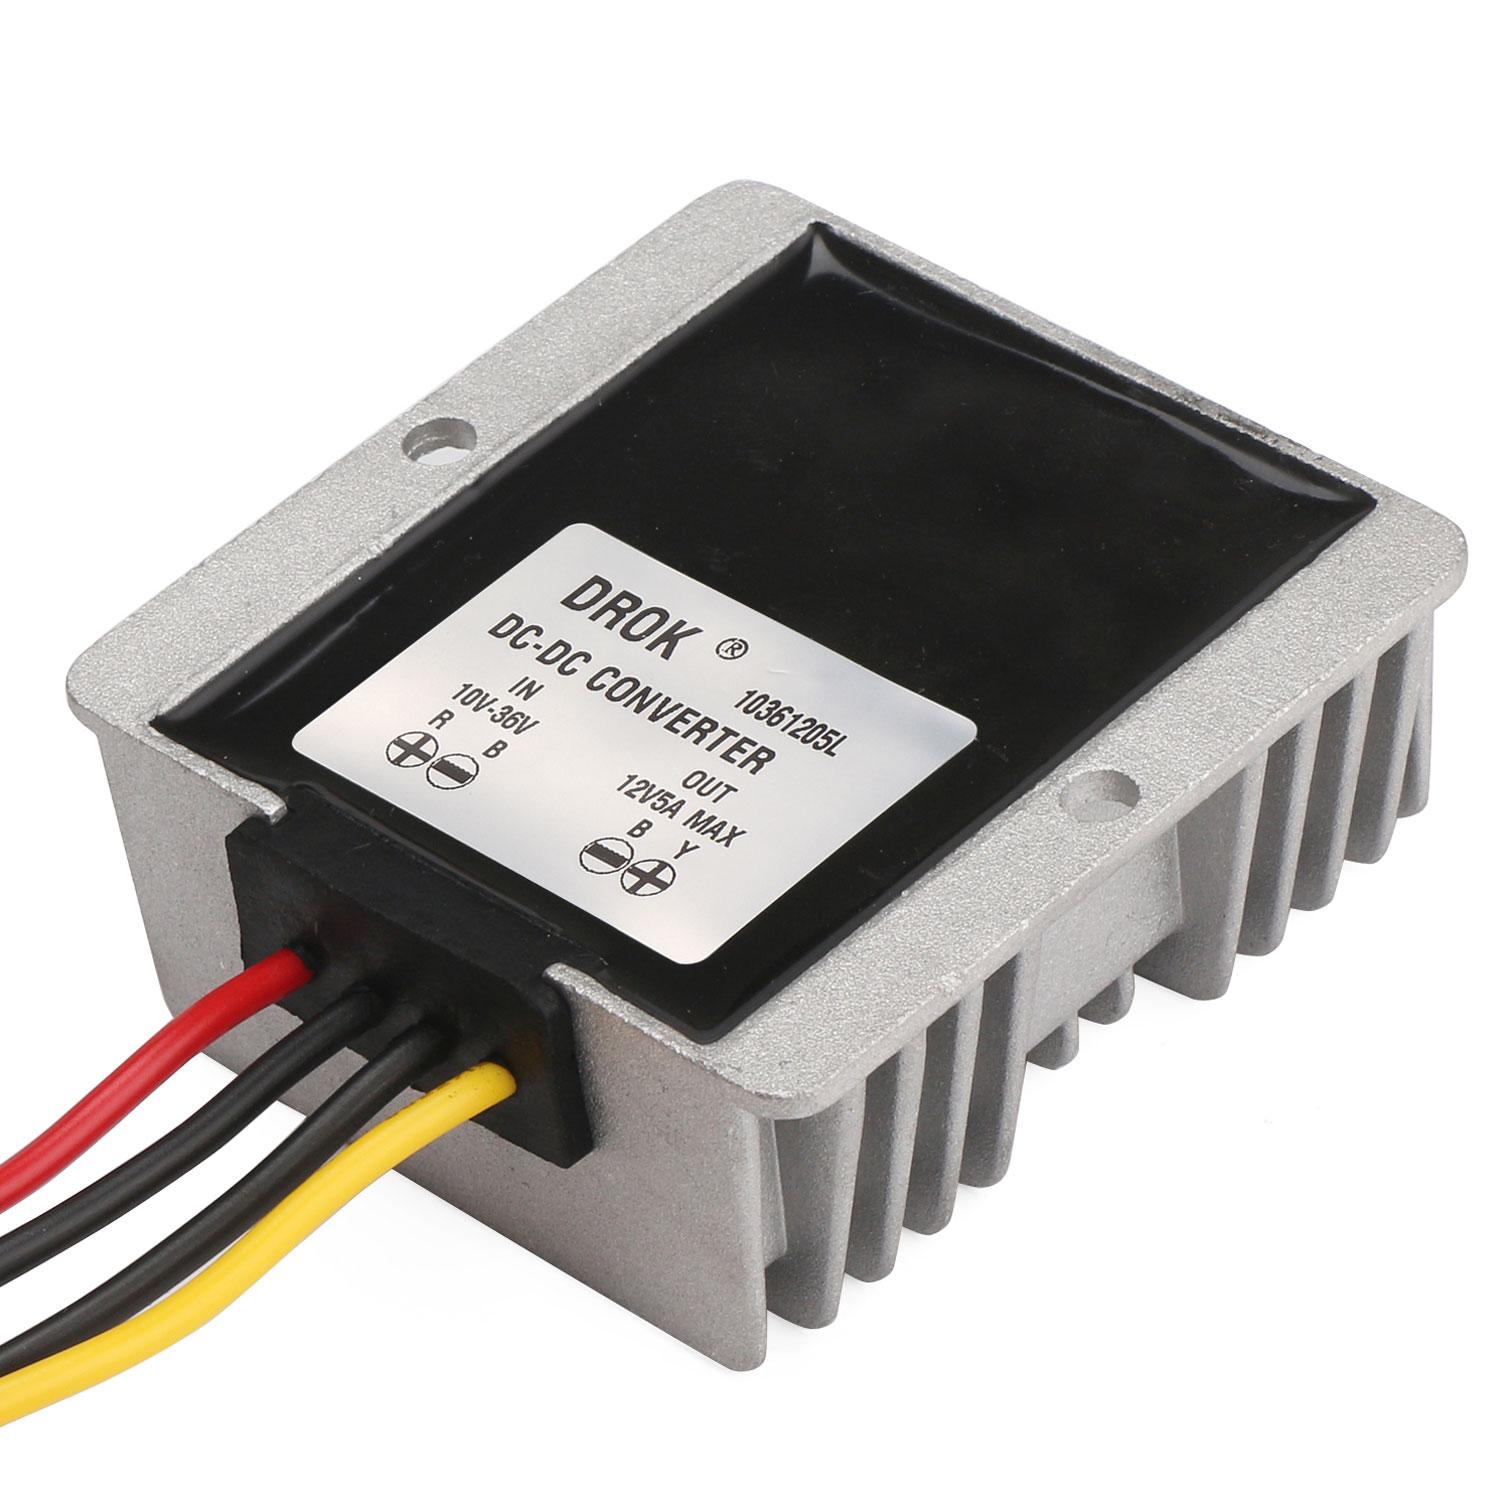 48V to 12V 5A DC//DC Step-DOWN Power Converter Regulator 60W WaterProof